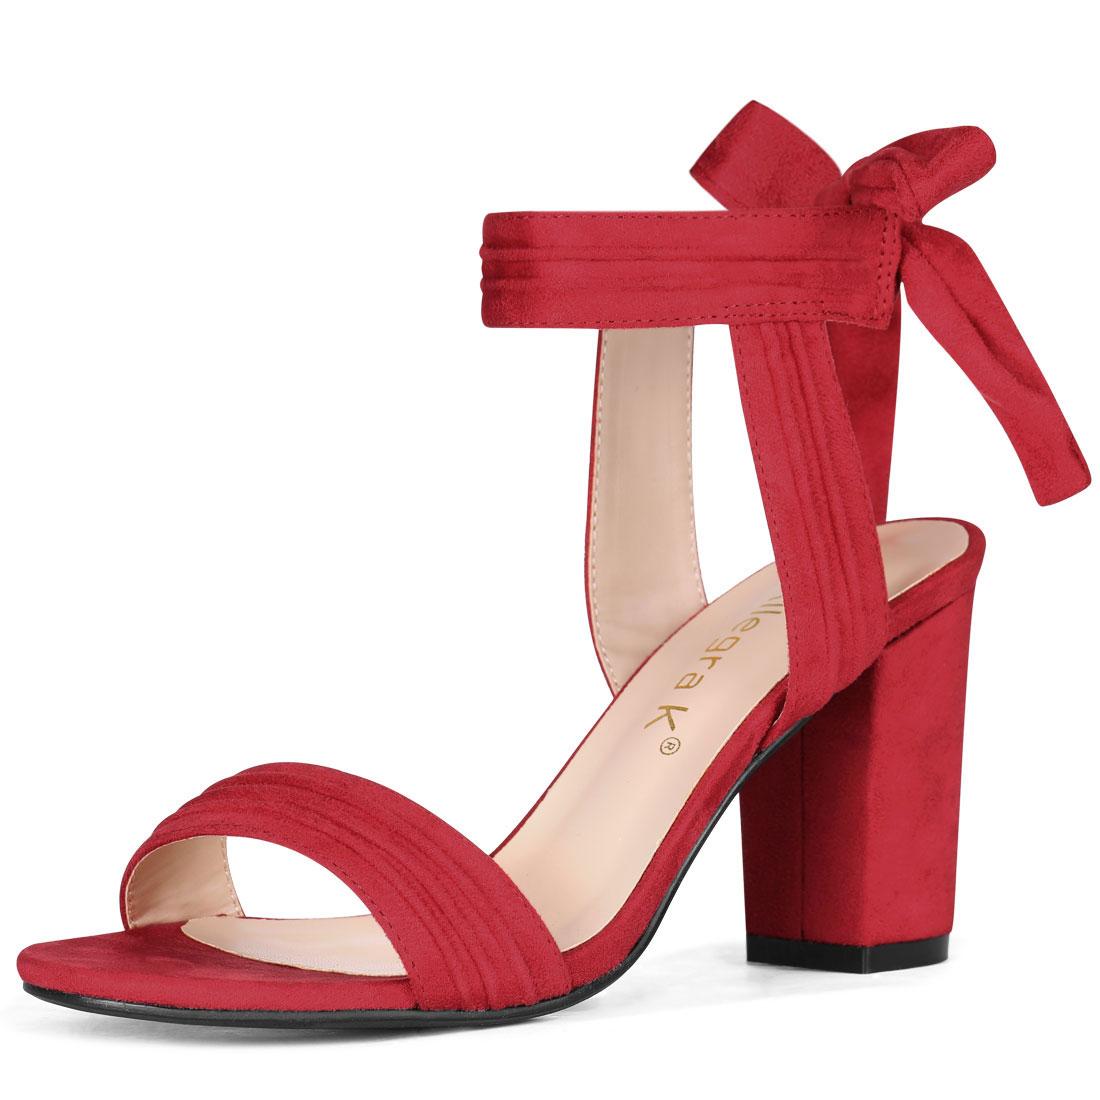 Allegra K Women's Open Toe Ankle Tie Back Chunky Heel Sandals Red US 6.5